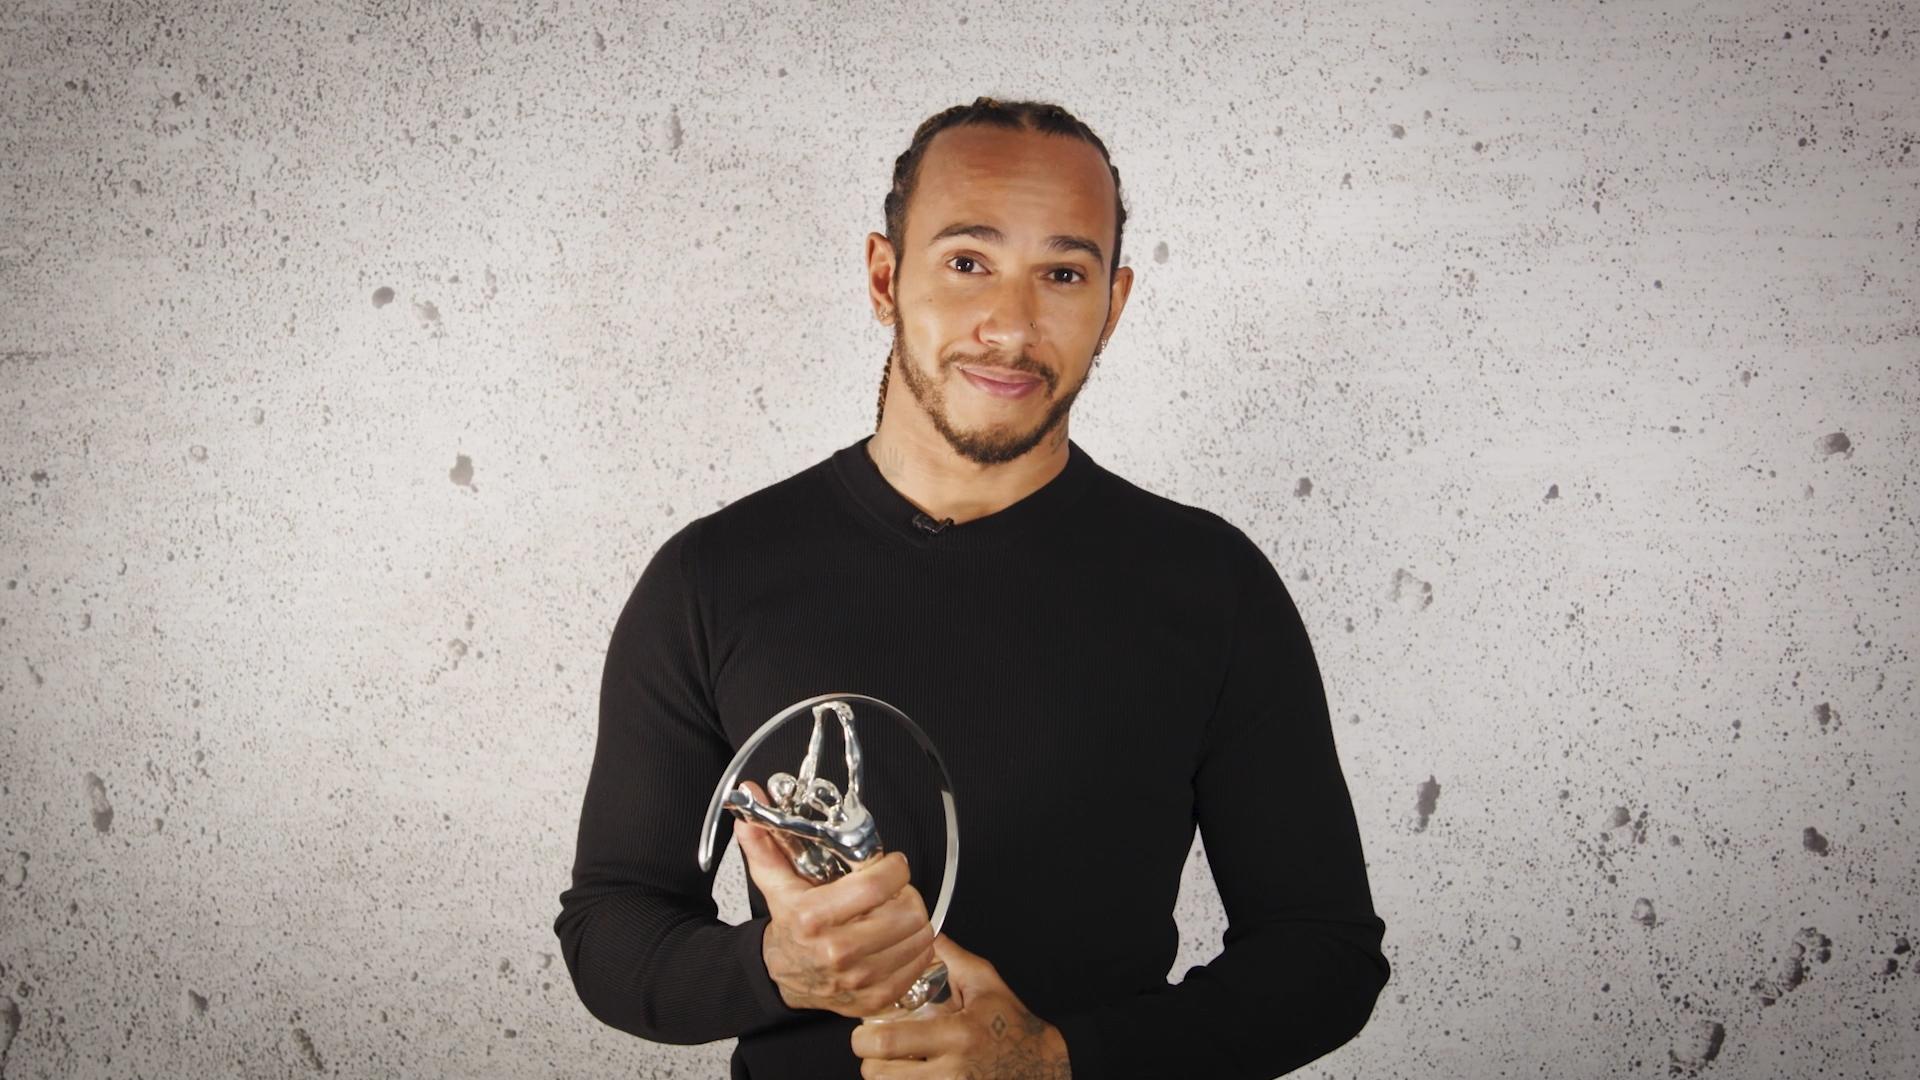 Seven-time Formula One World Champion Lewis Hamilton wins award at virtual Laureus Awards ceremony